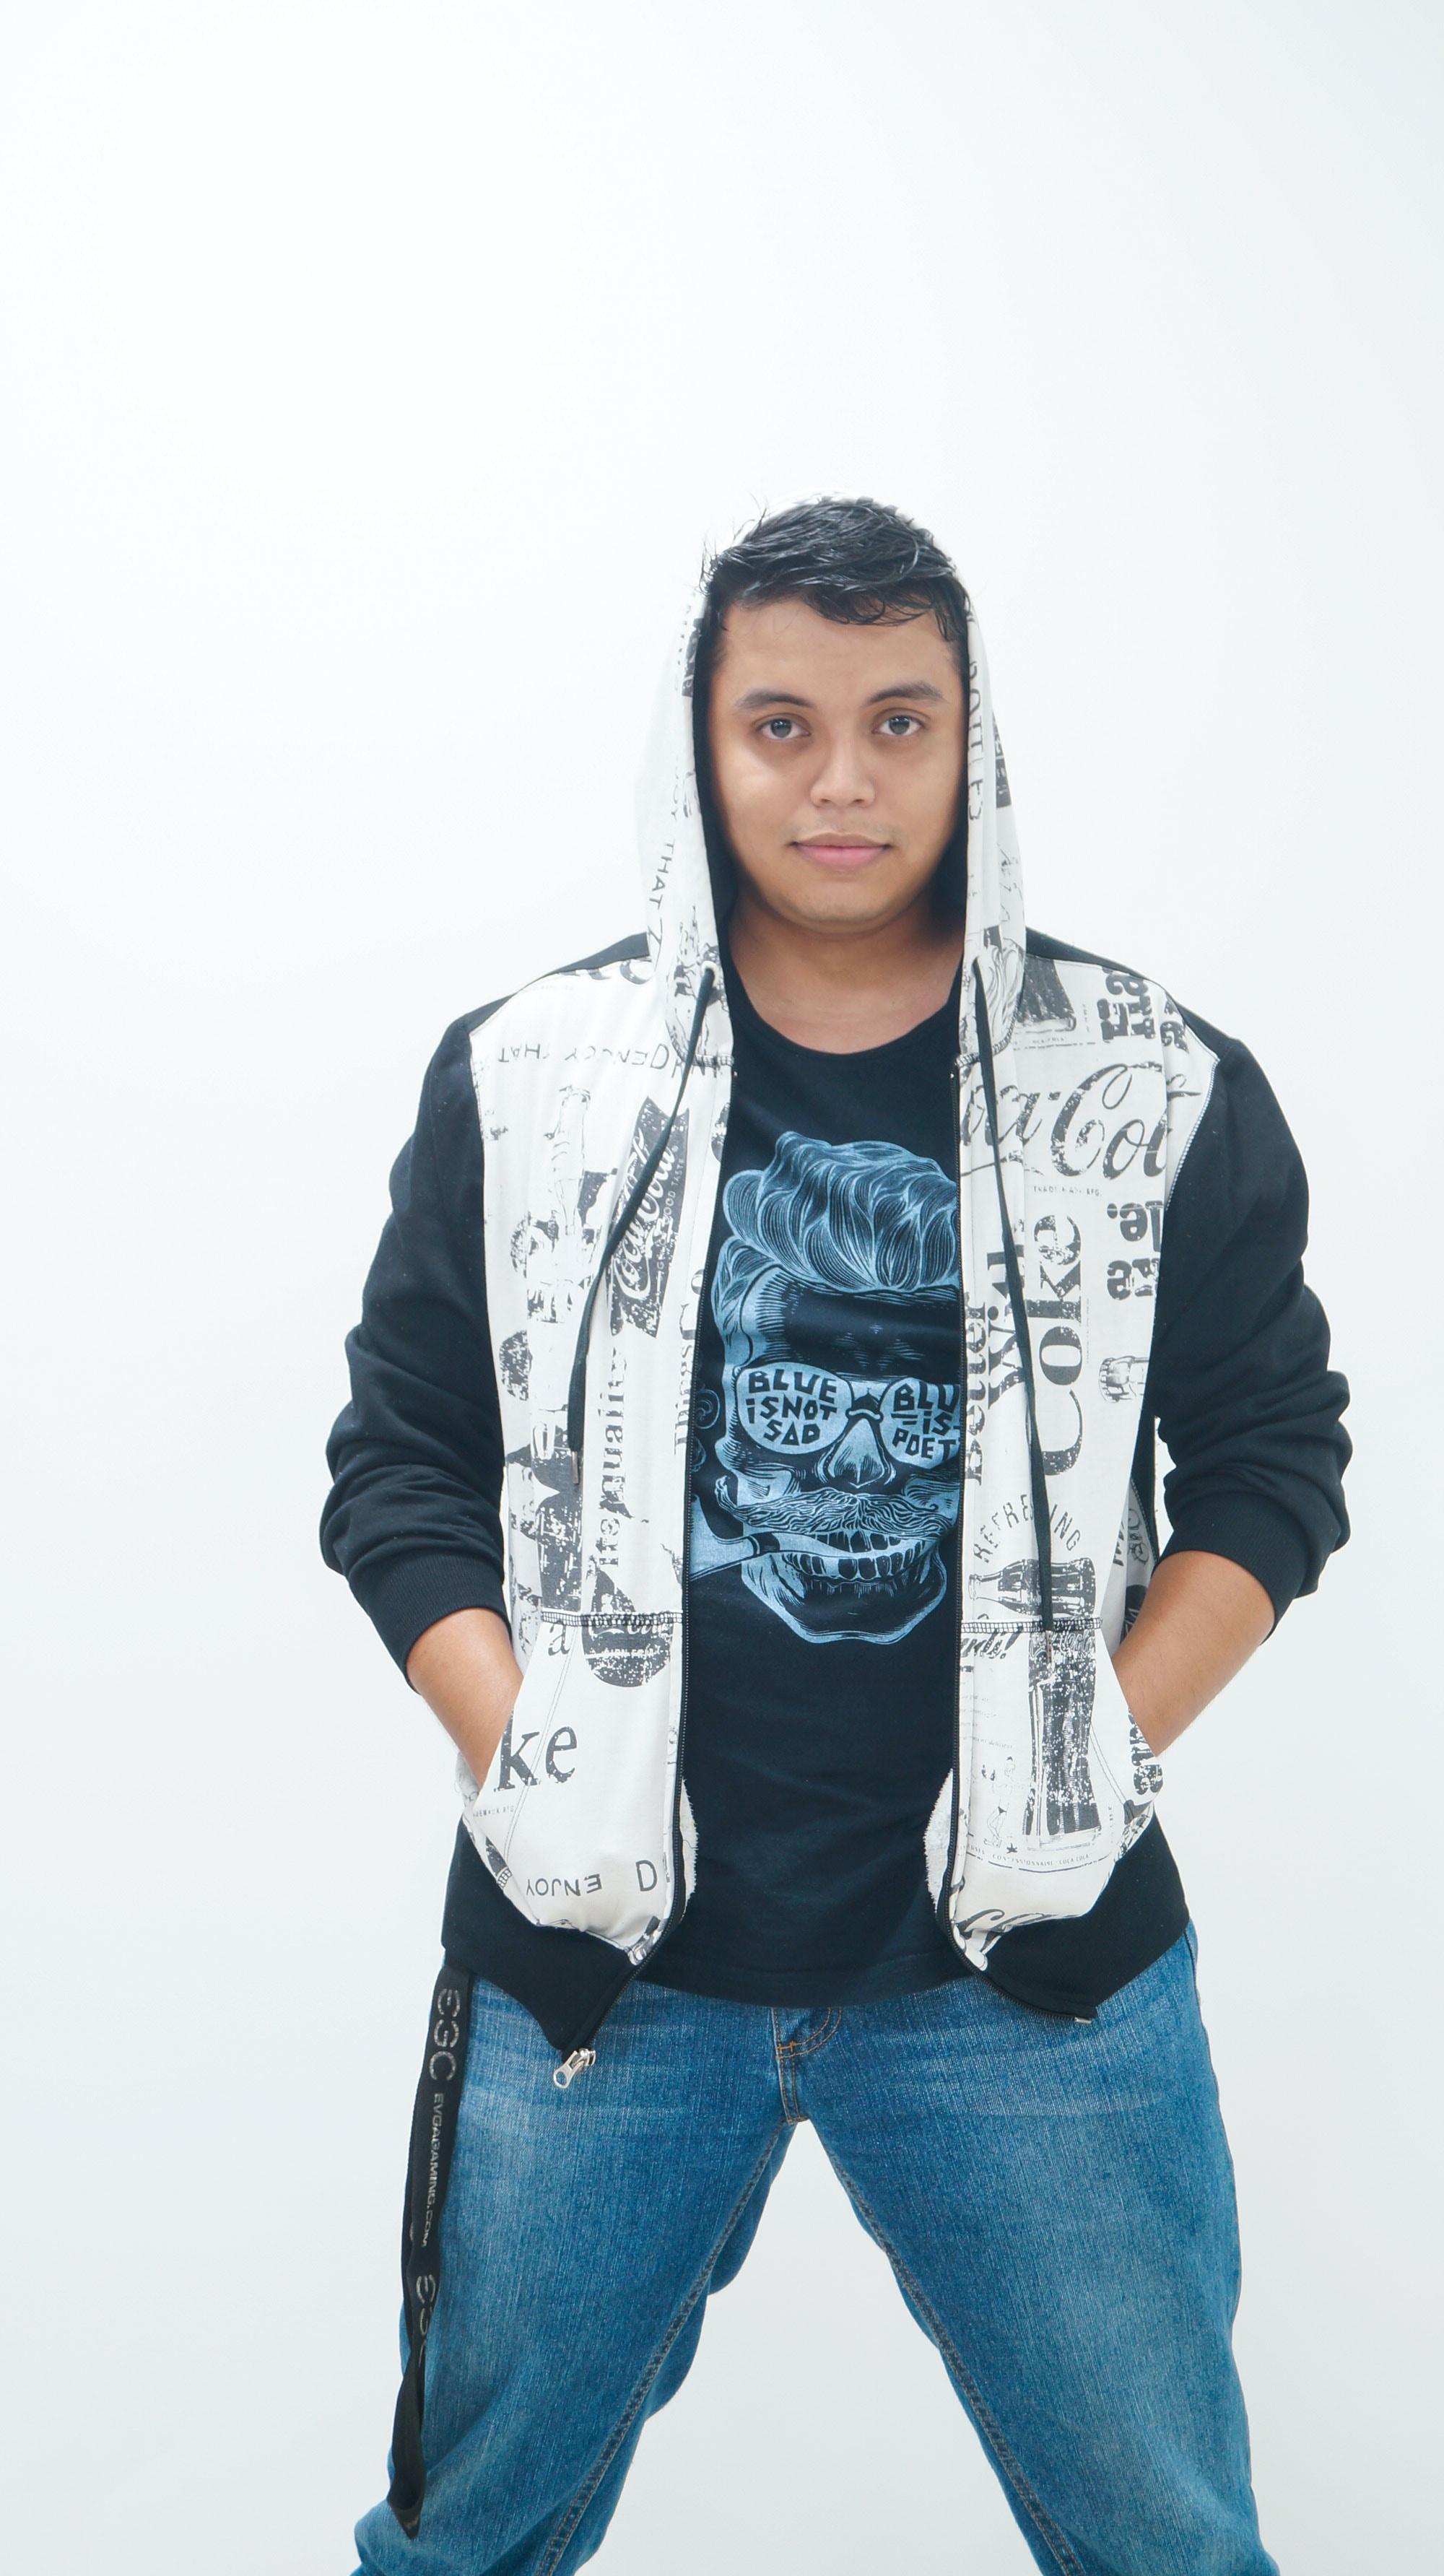 Go to Juan Apolinar's profile